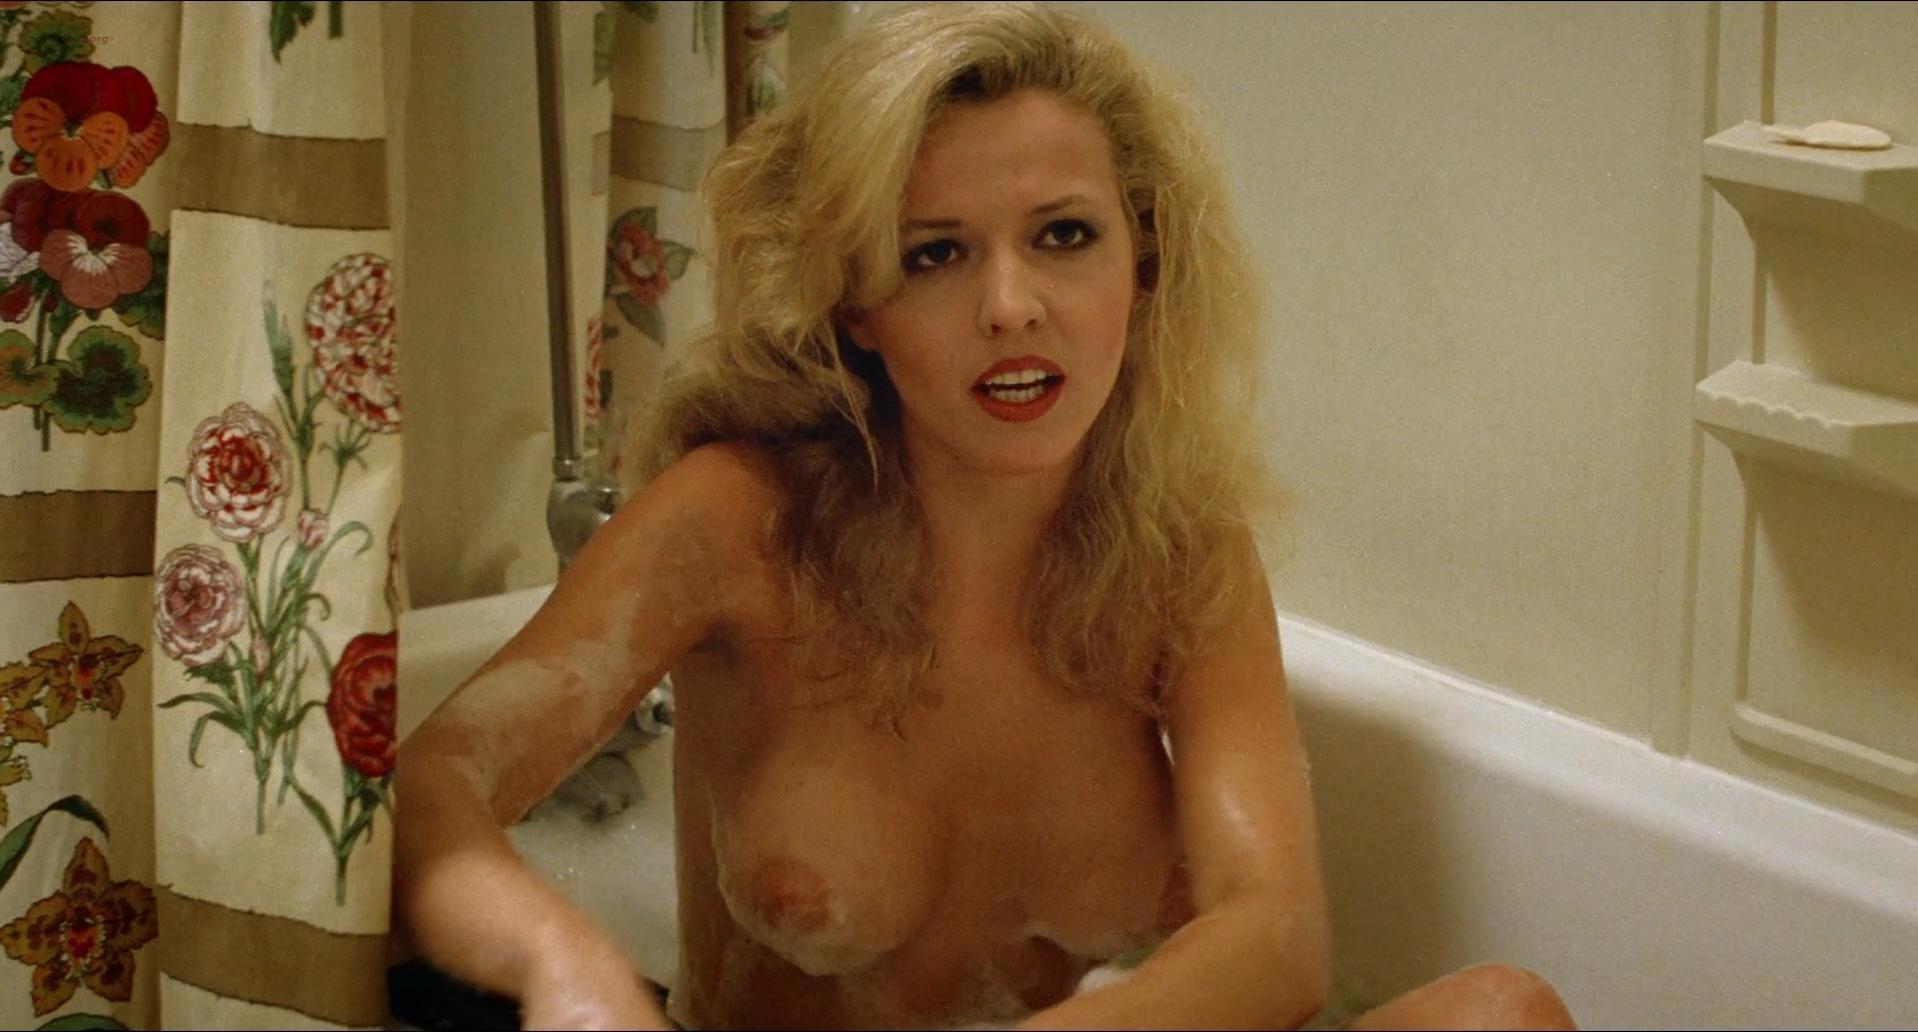 Angelique Pettyjohn Porn Movies showing xxx images for jade pettyjohn porn xxx | free